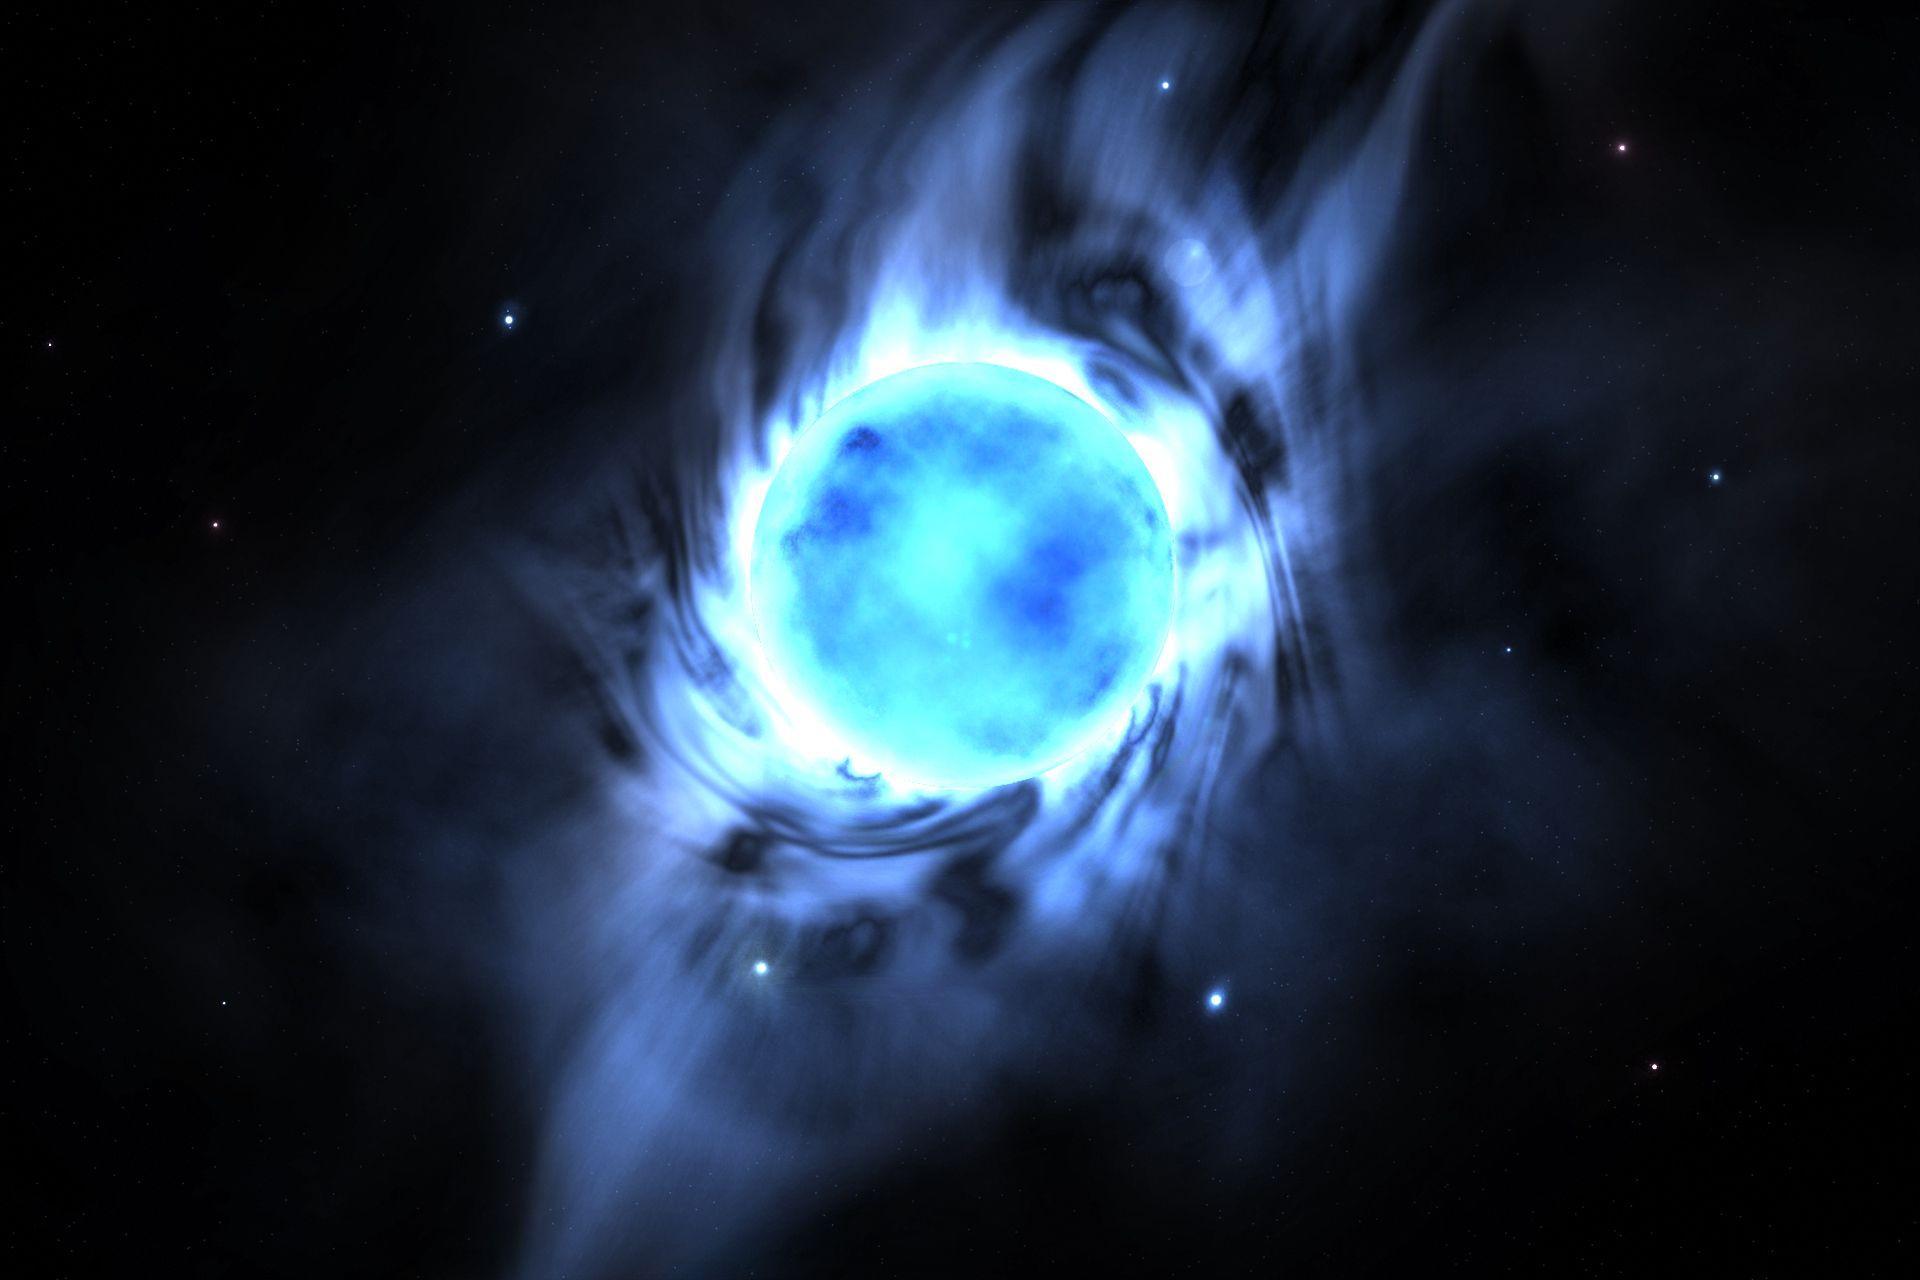 supernova desktop wallpaper - photo #11